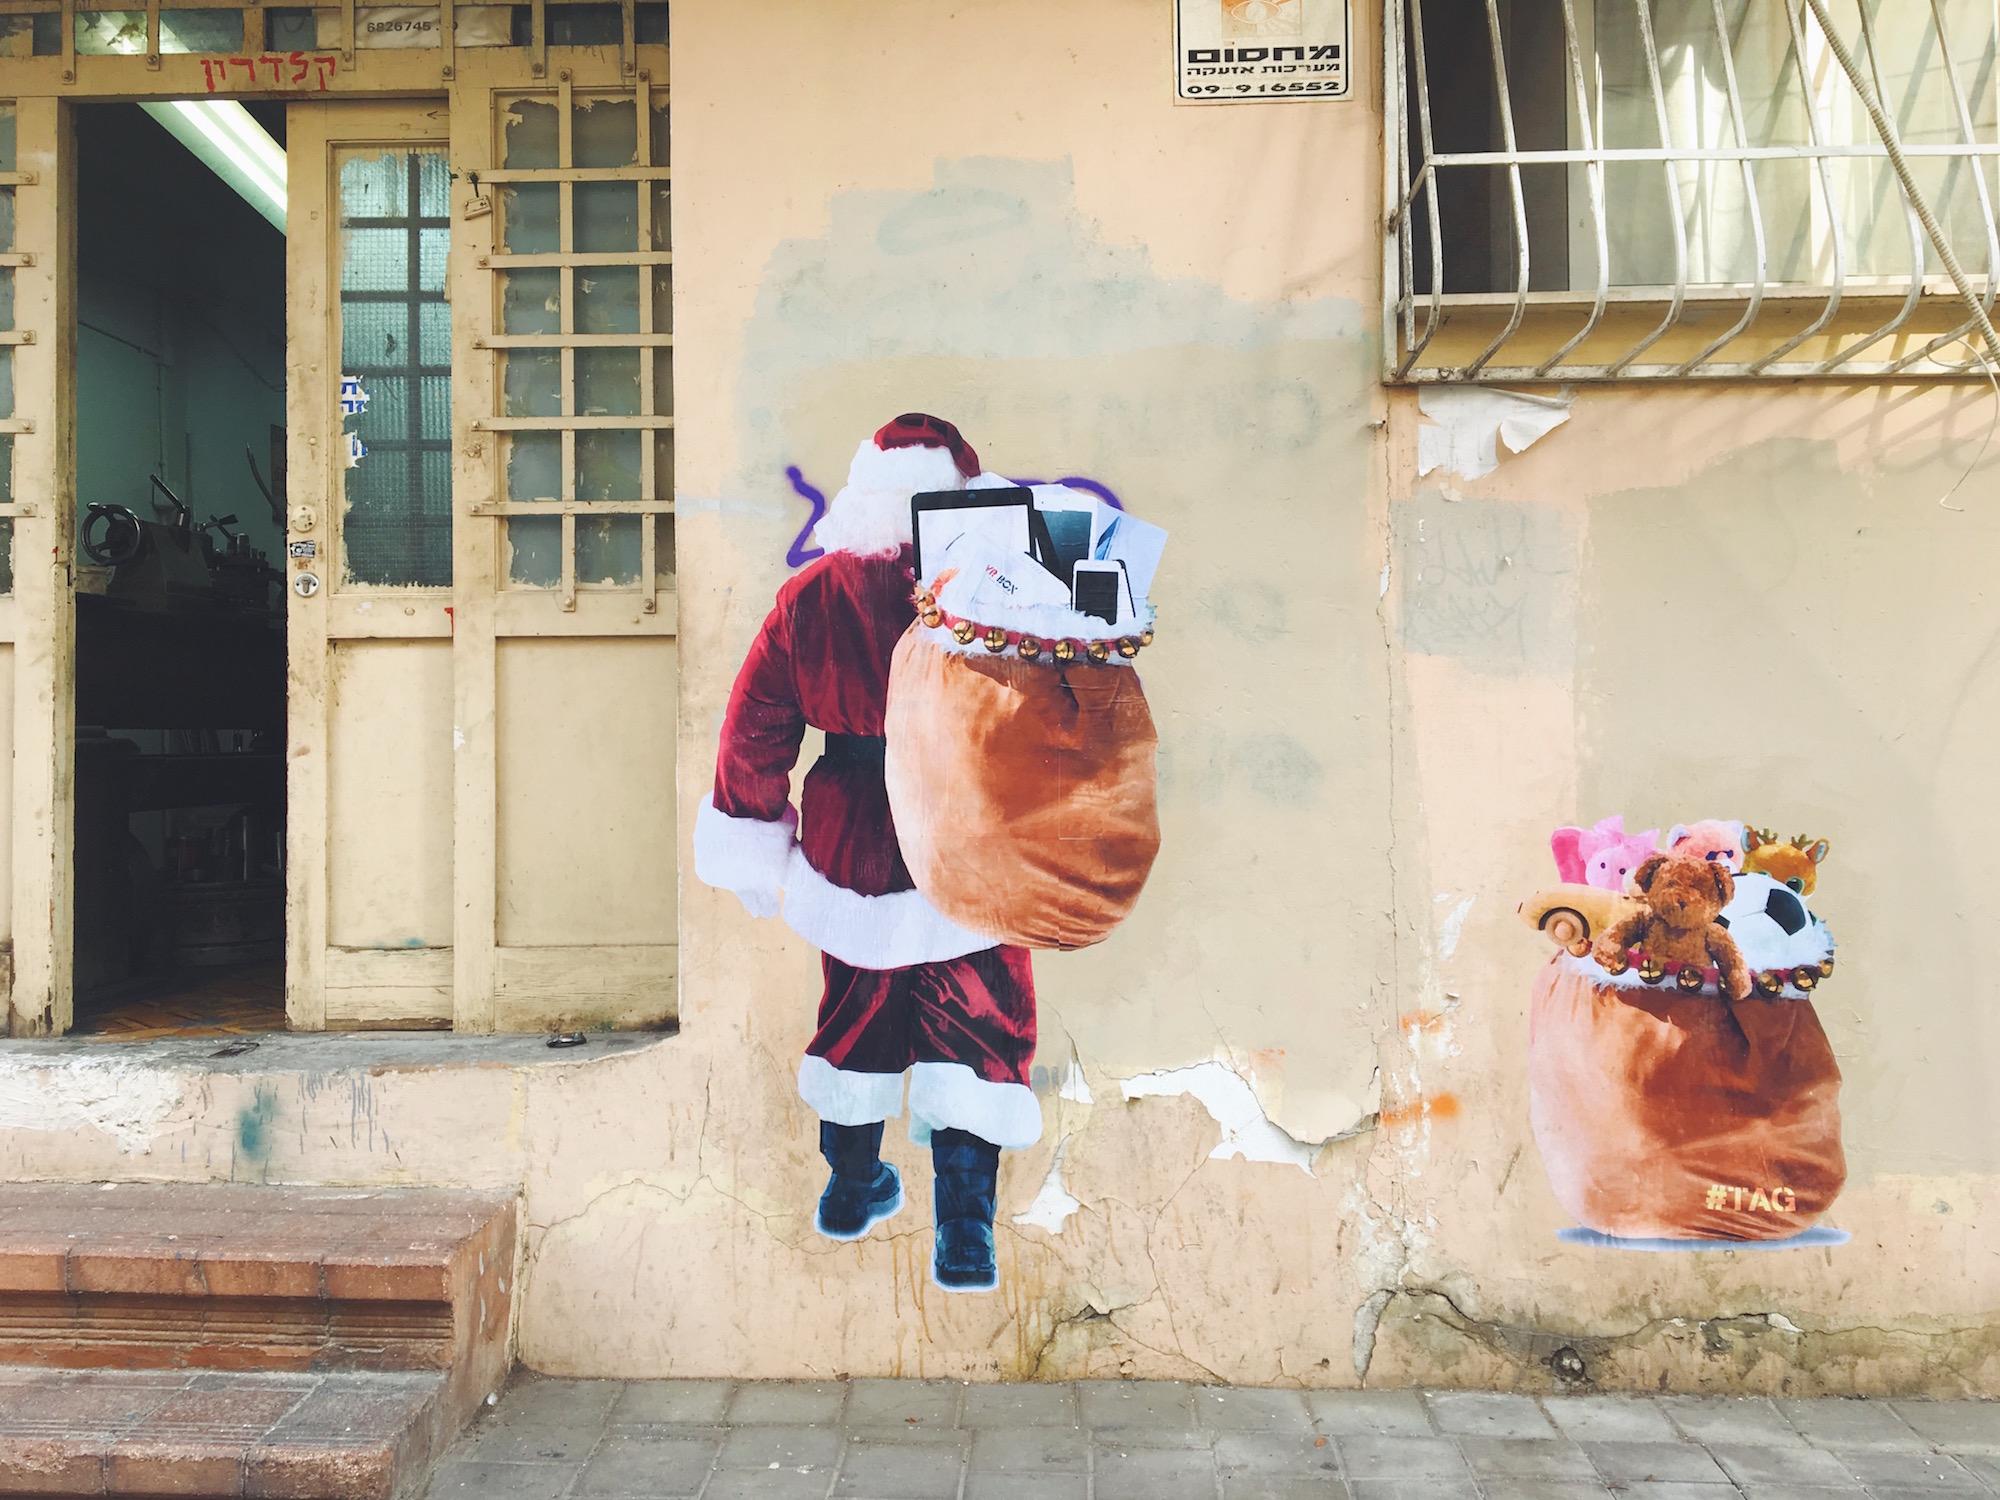 Graffiti e murales a Tel Aviv, Israele - Il quartiere Florentin